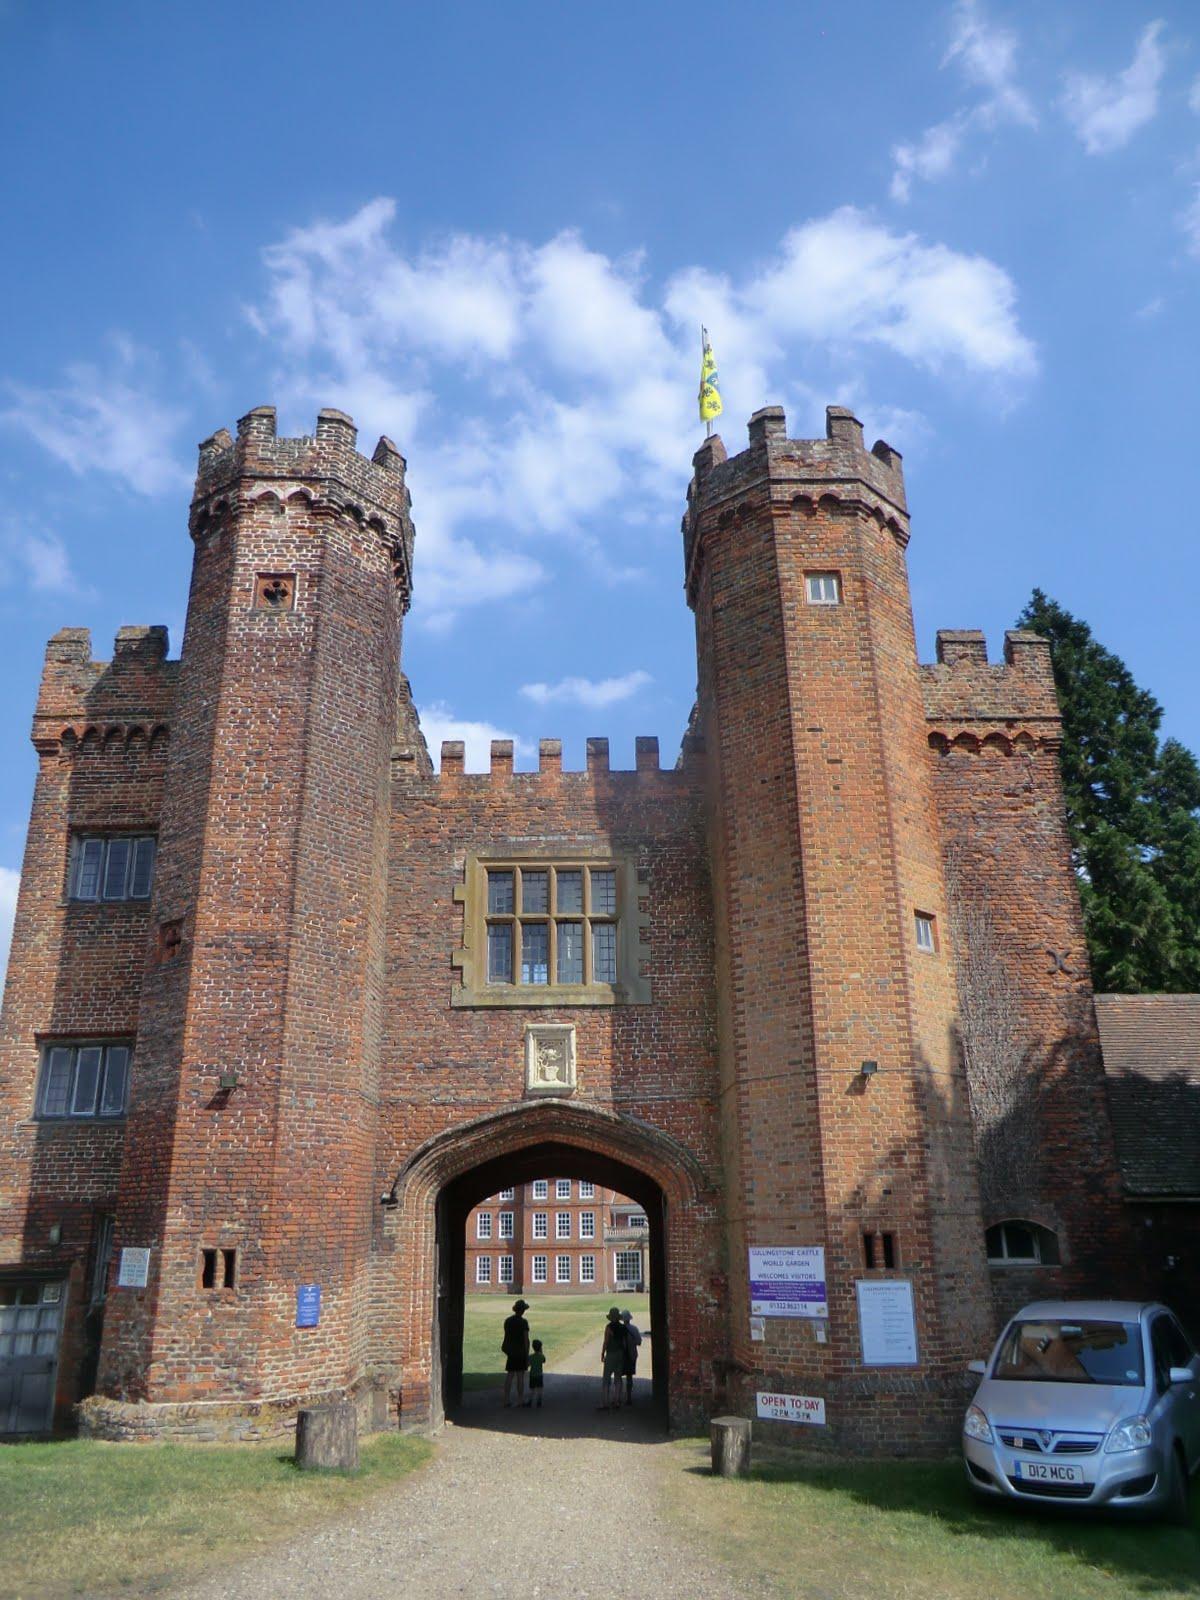 CIMG7507 Tudor Gatehouse, Lullingstone Castle